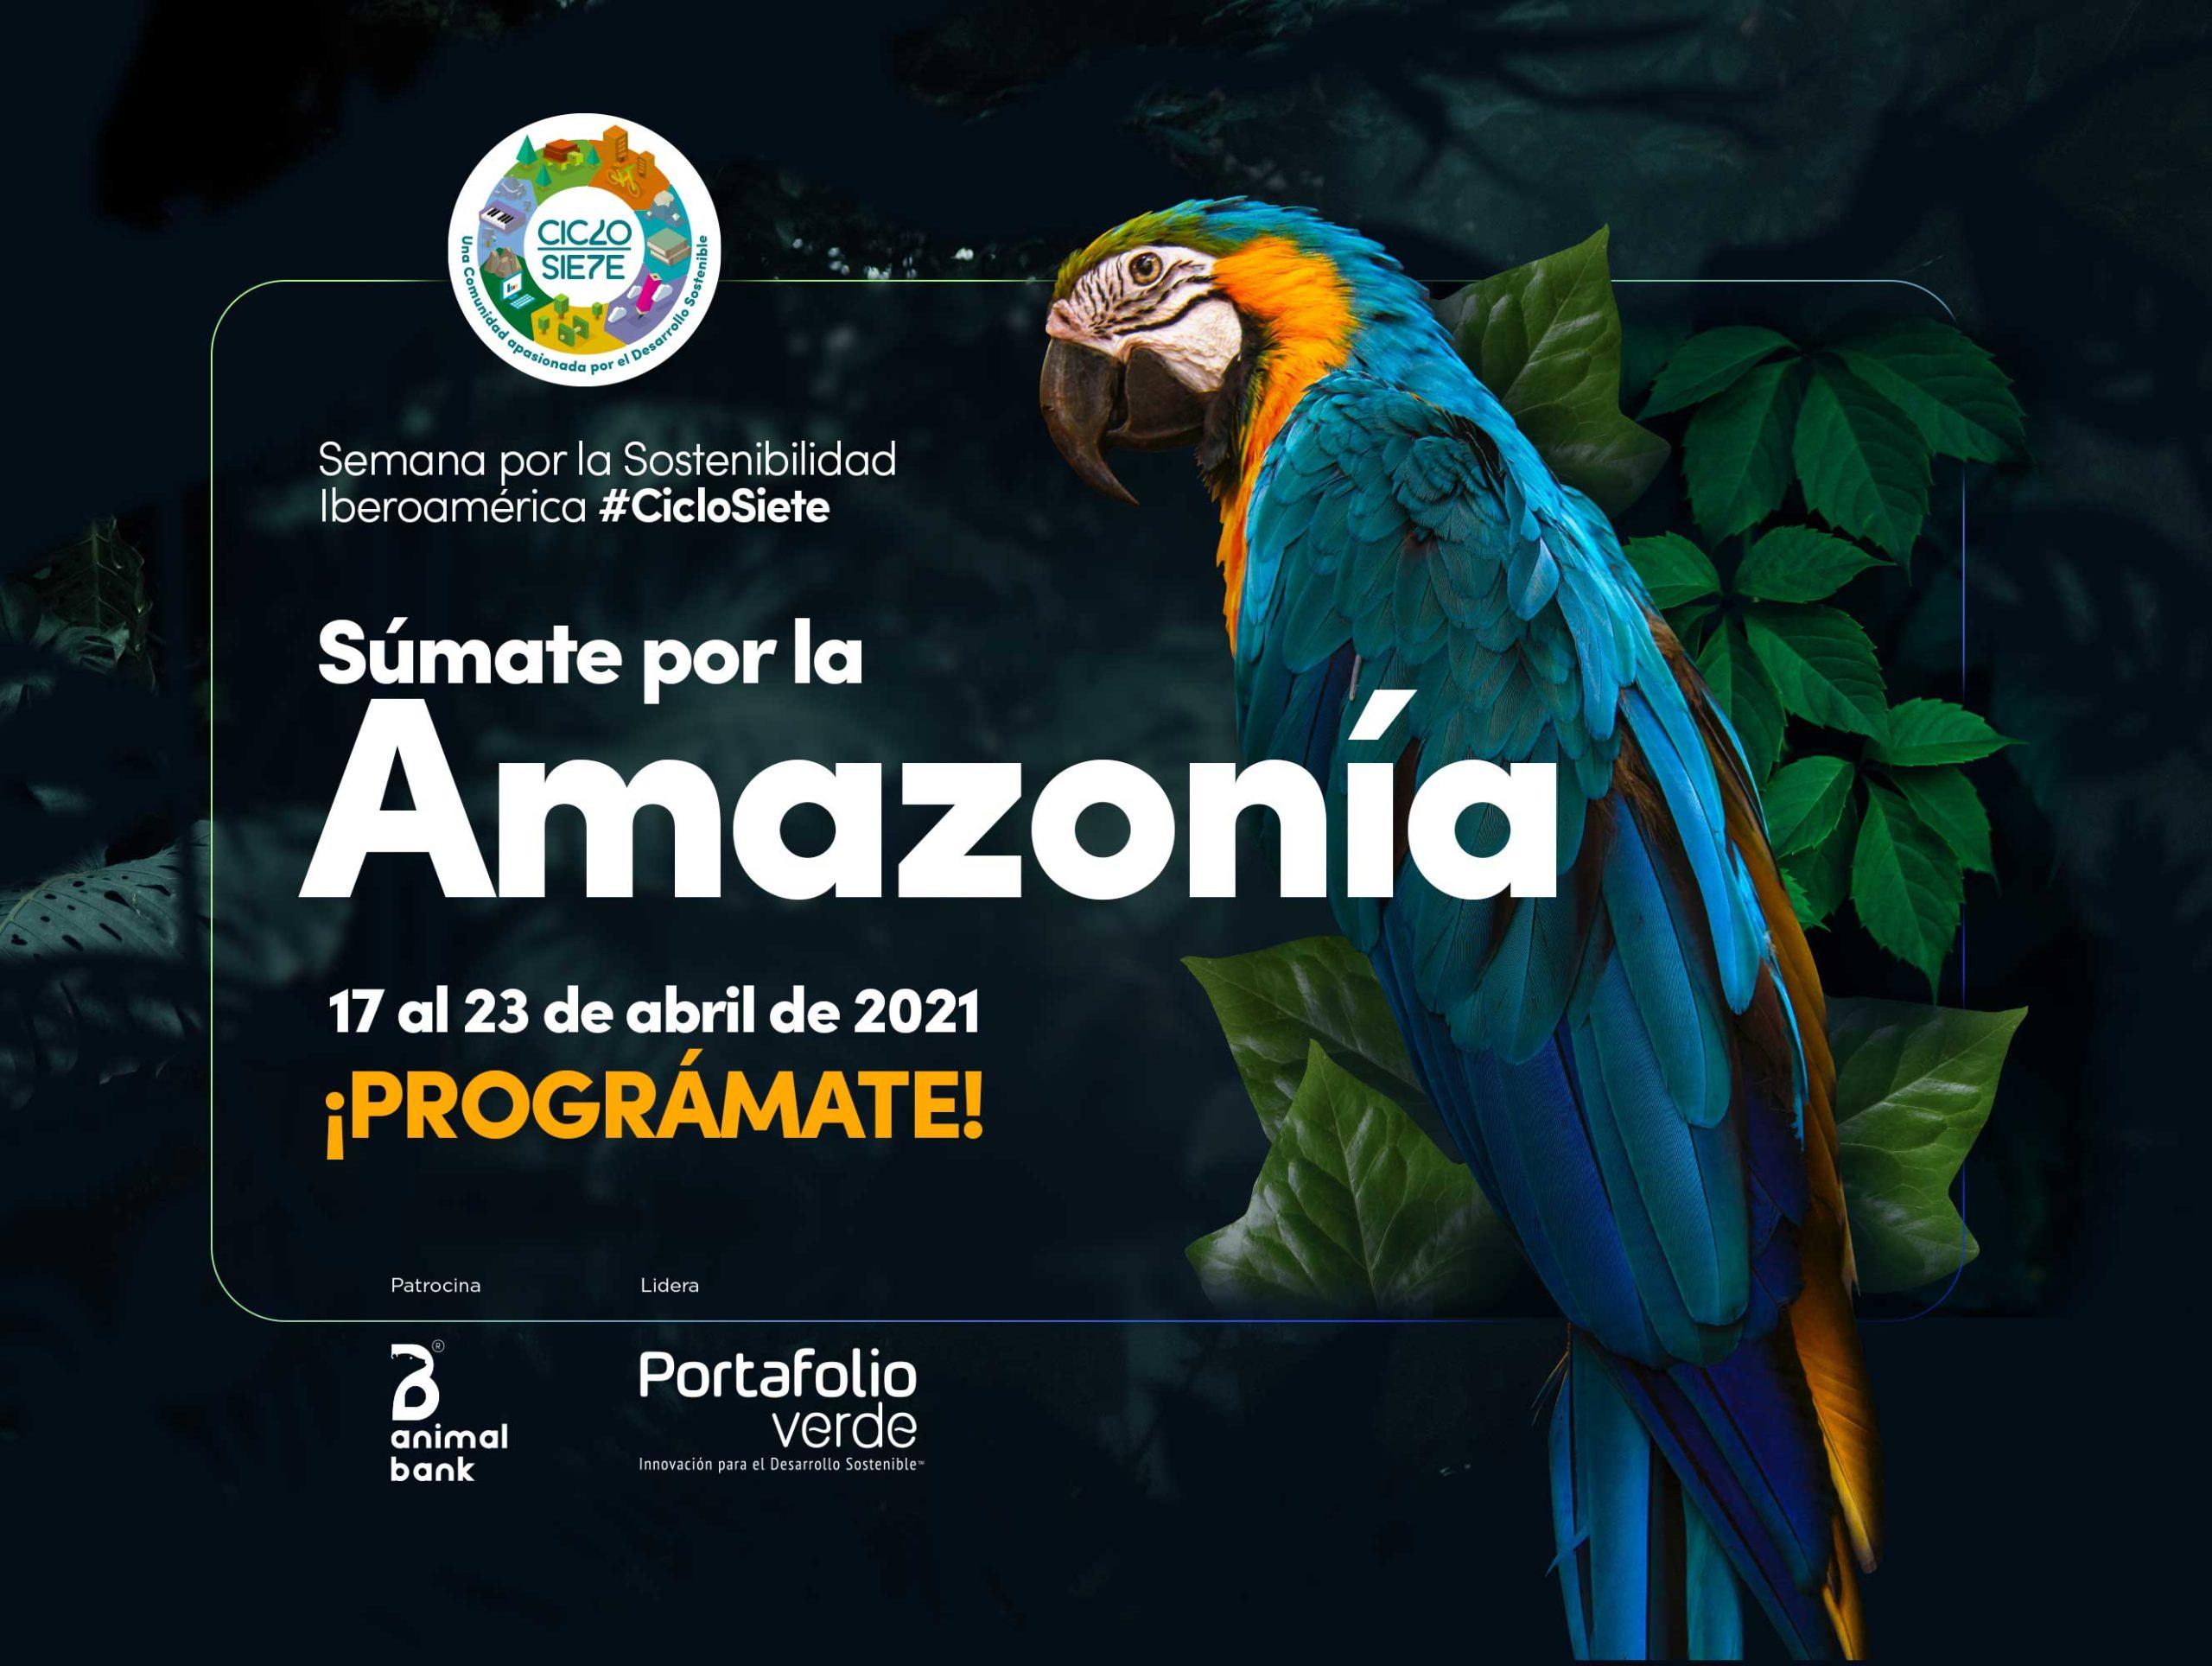 súmate por la Amazonía